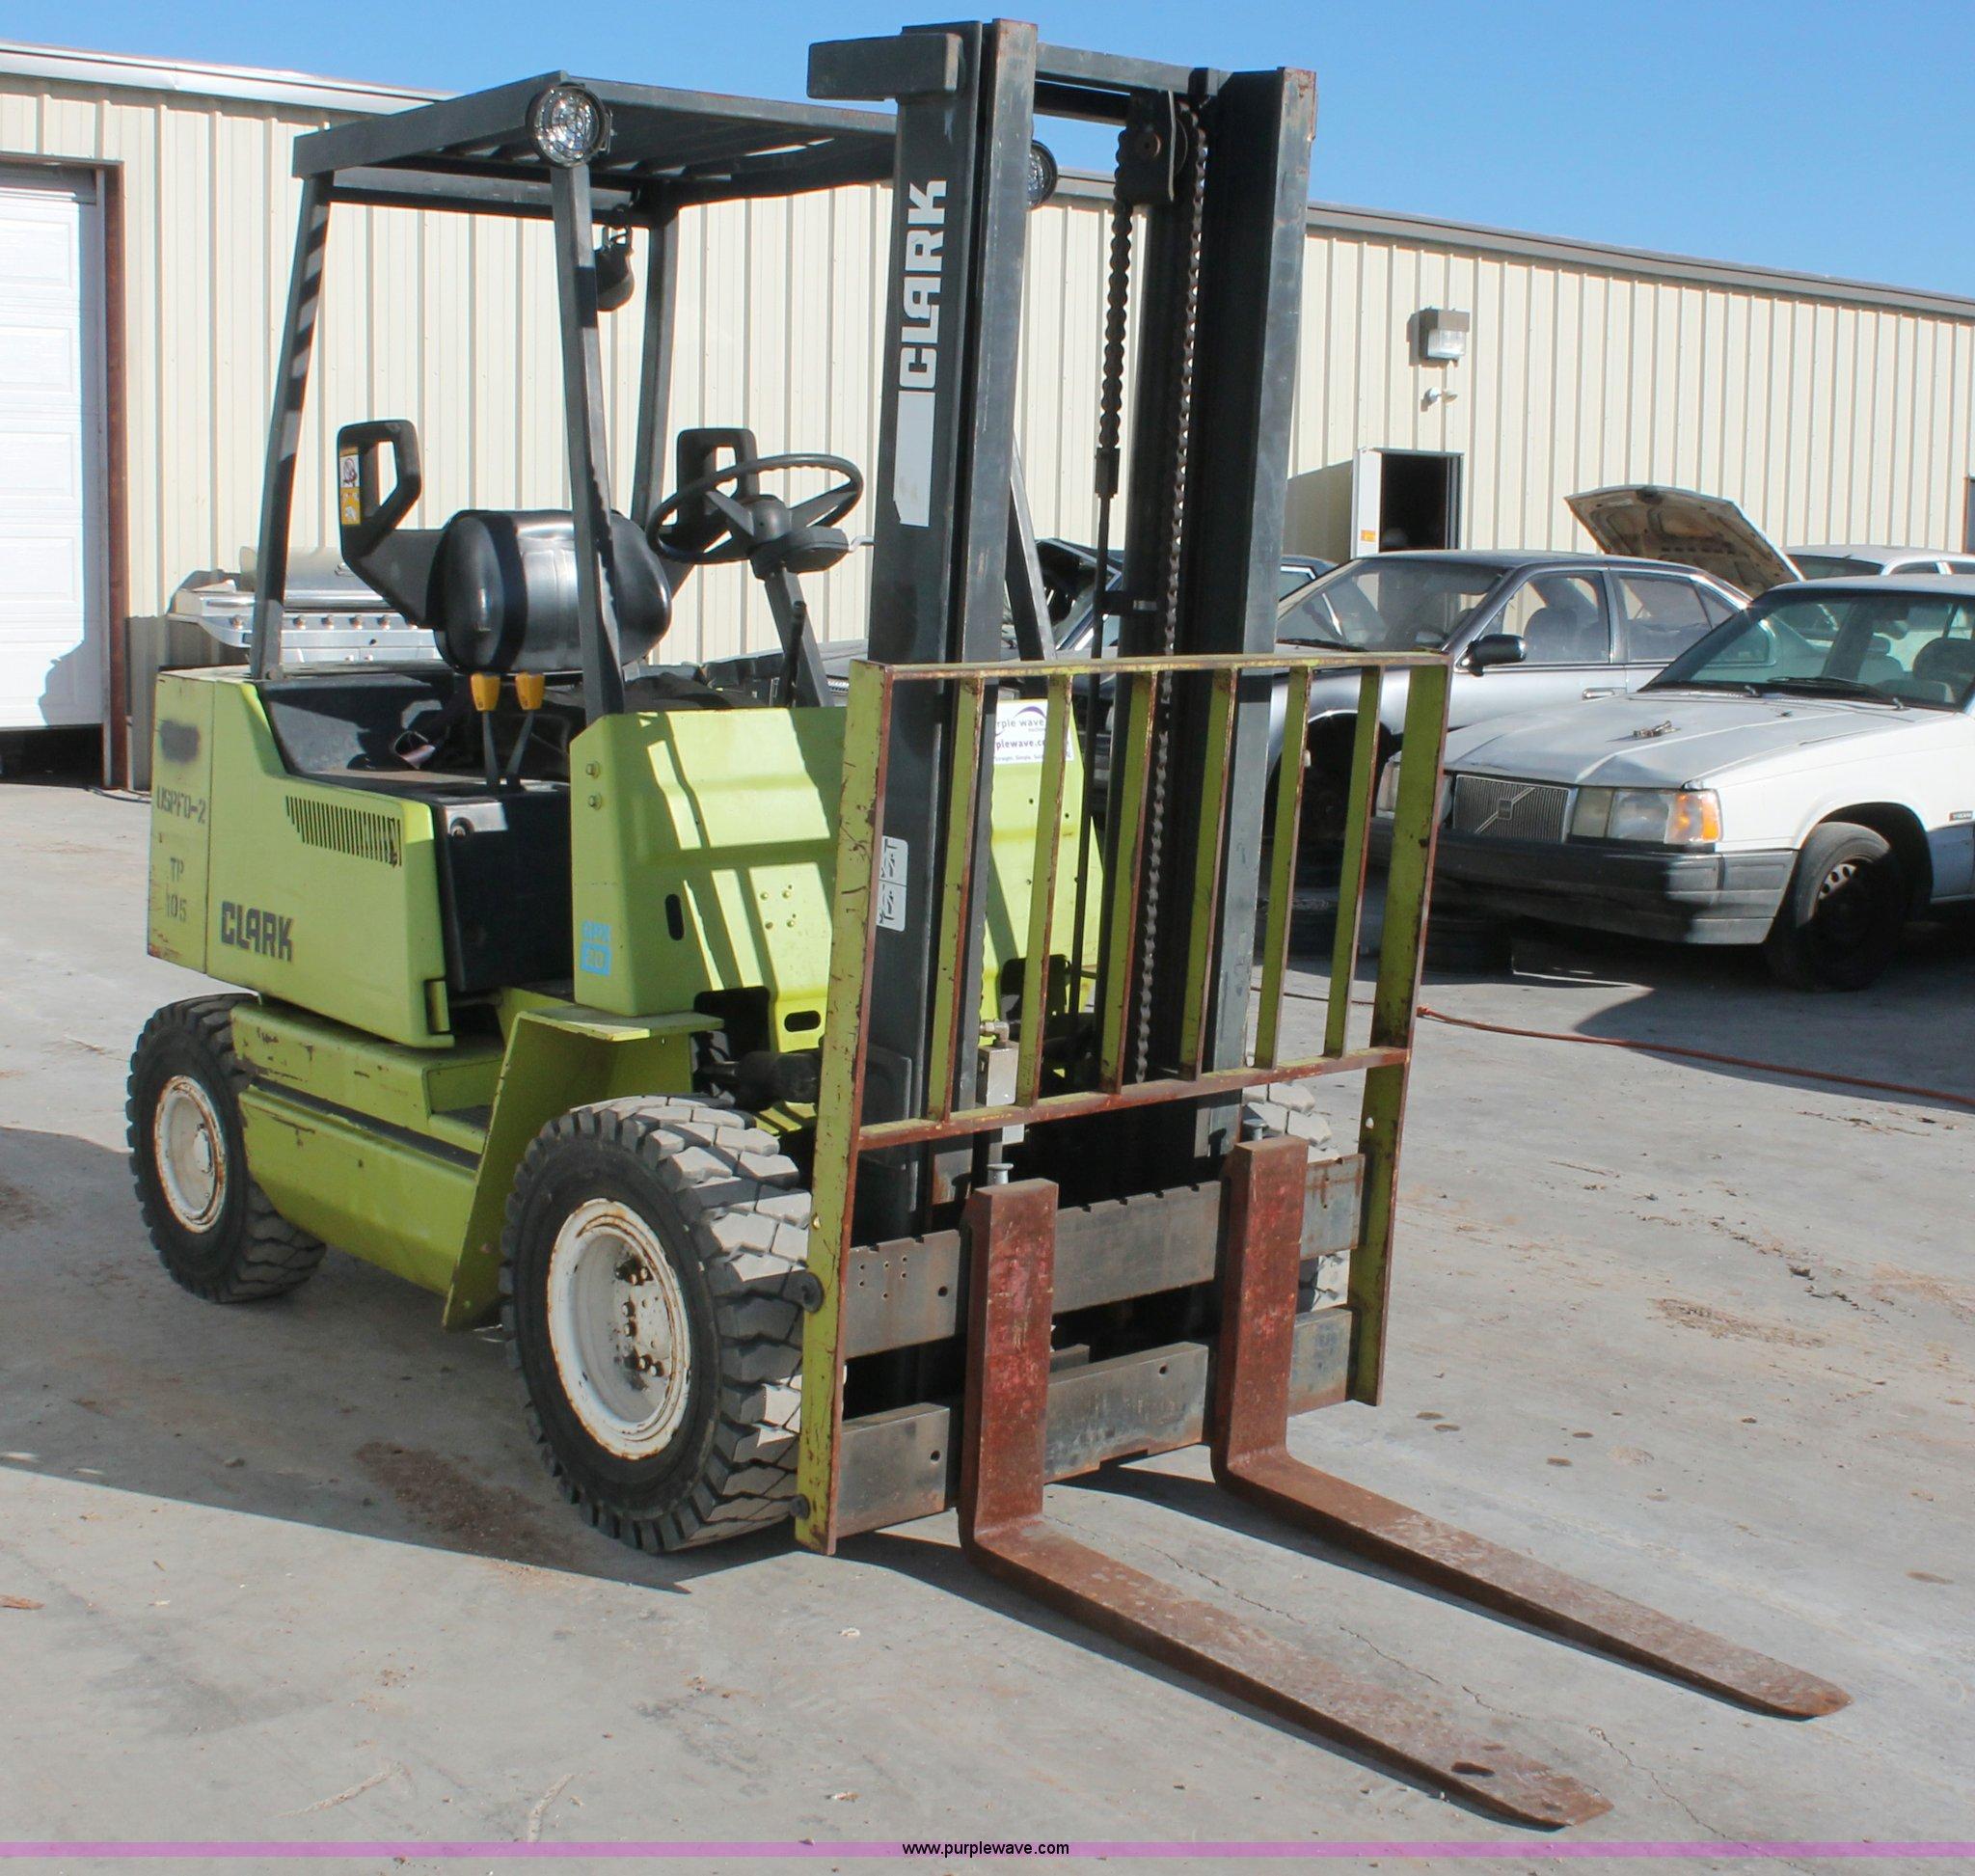 Clark GPX20 forklift in Norman, OK | Item L6841 sold ...